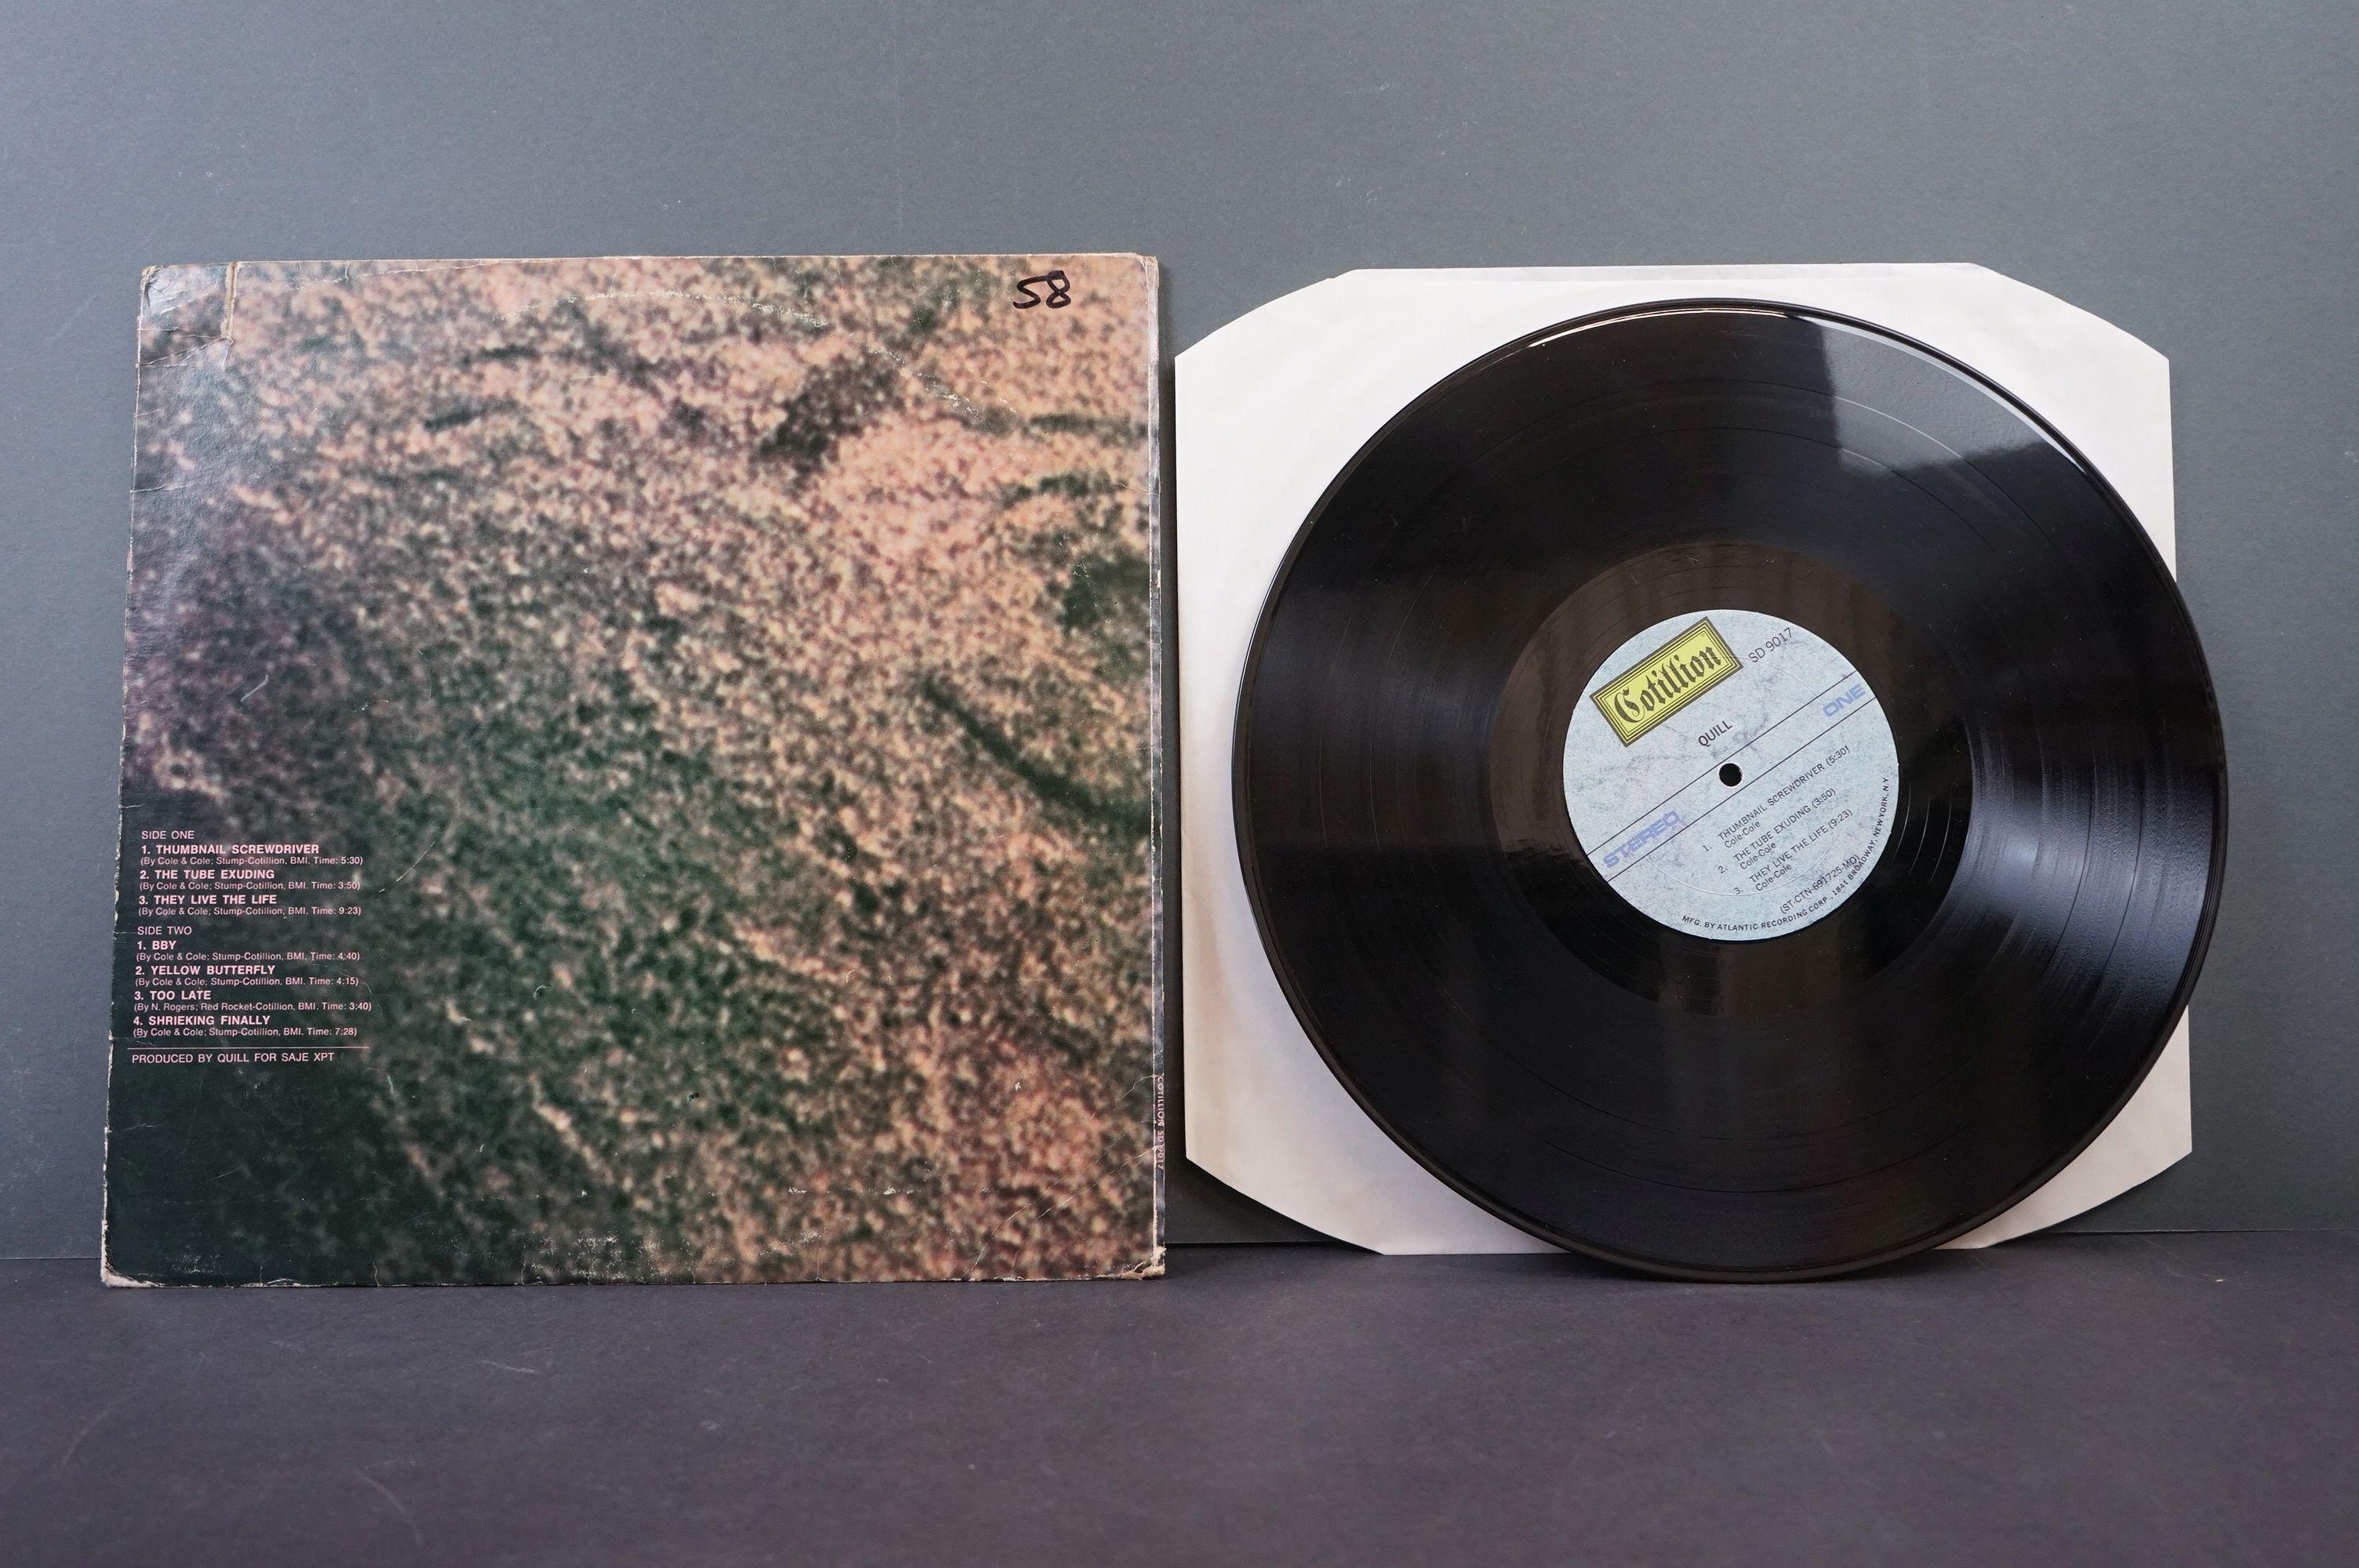 Vinyl - Psych - Three original Rare US pressing Psych albums. Maypole - Maypole (1971 US, Colossus - Image 7 of 8